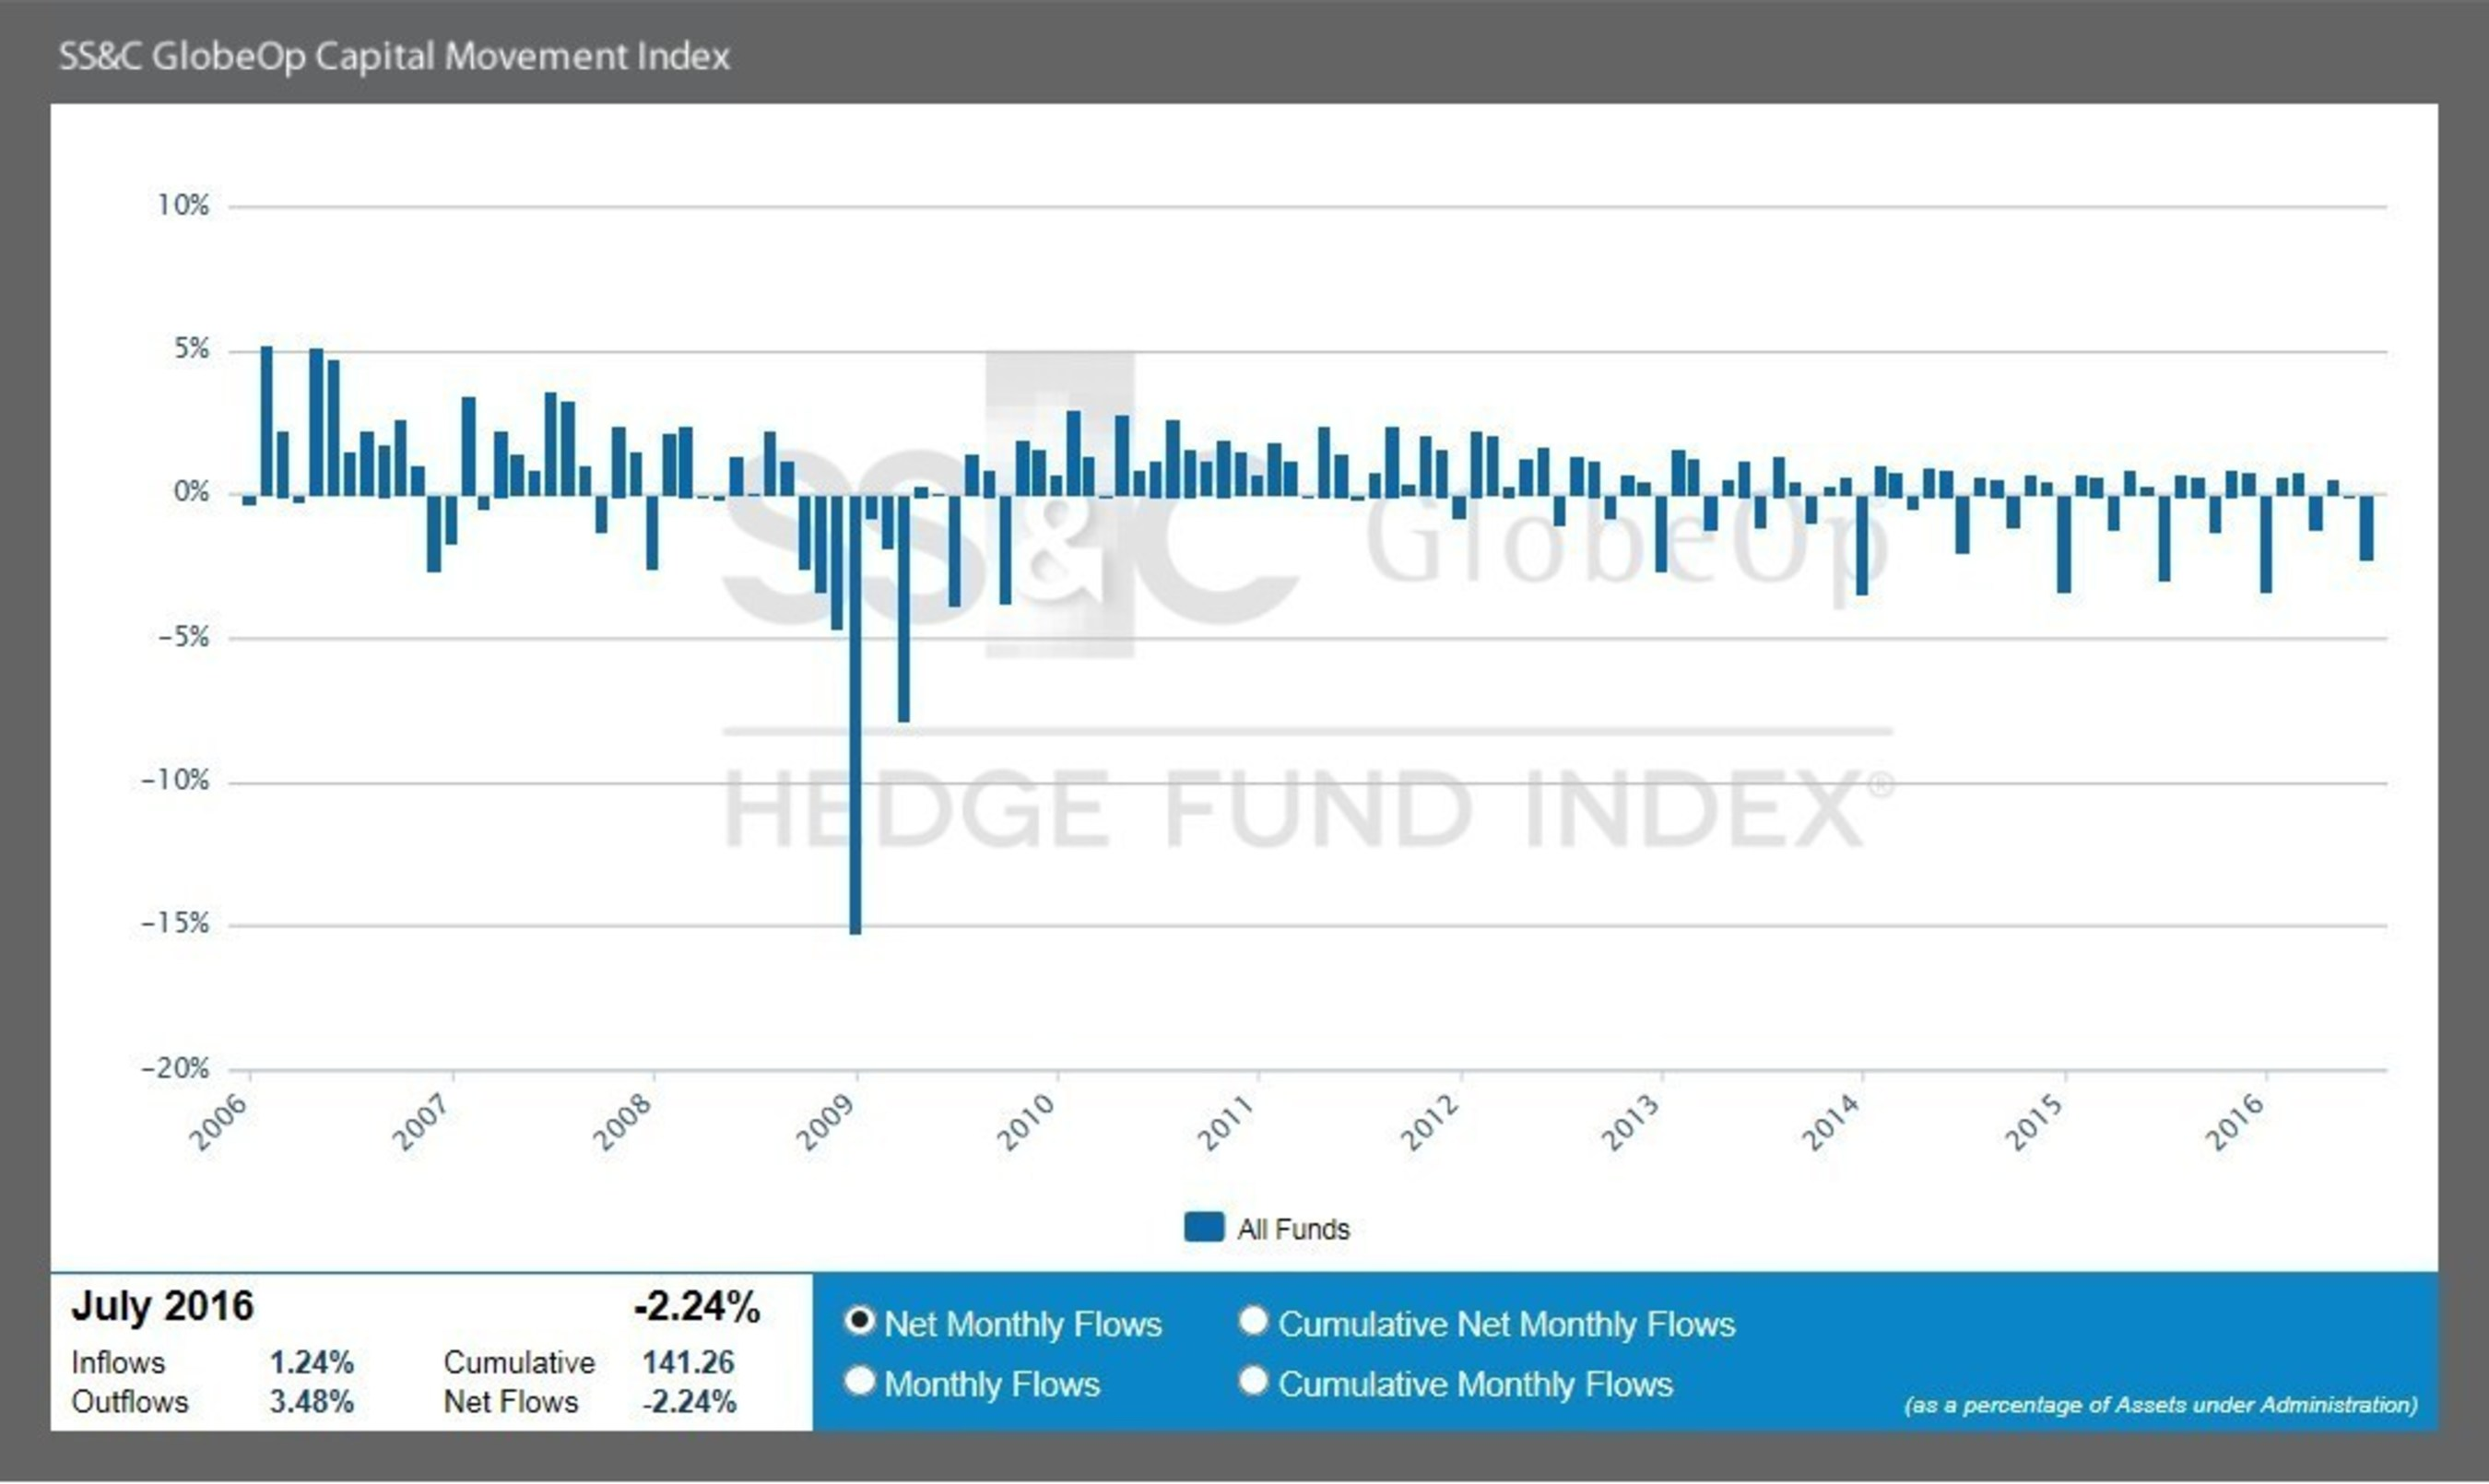 July SS&C GlobeOp Capital Movement Index